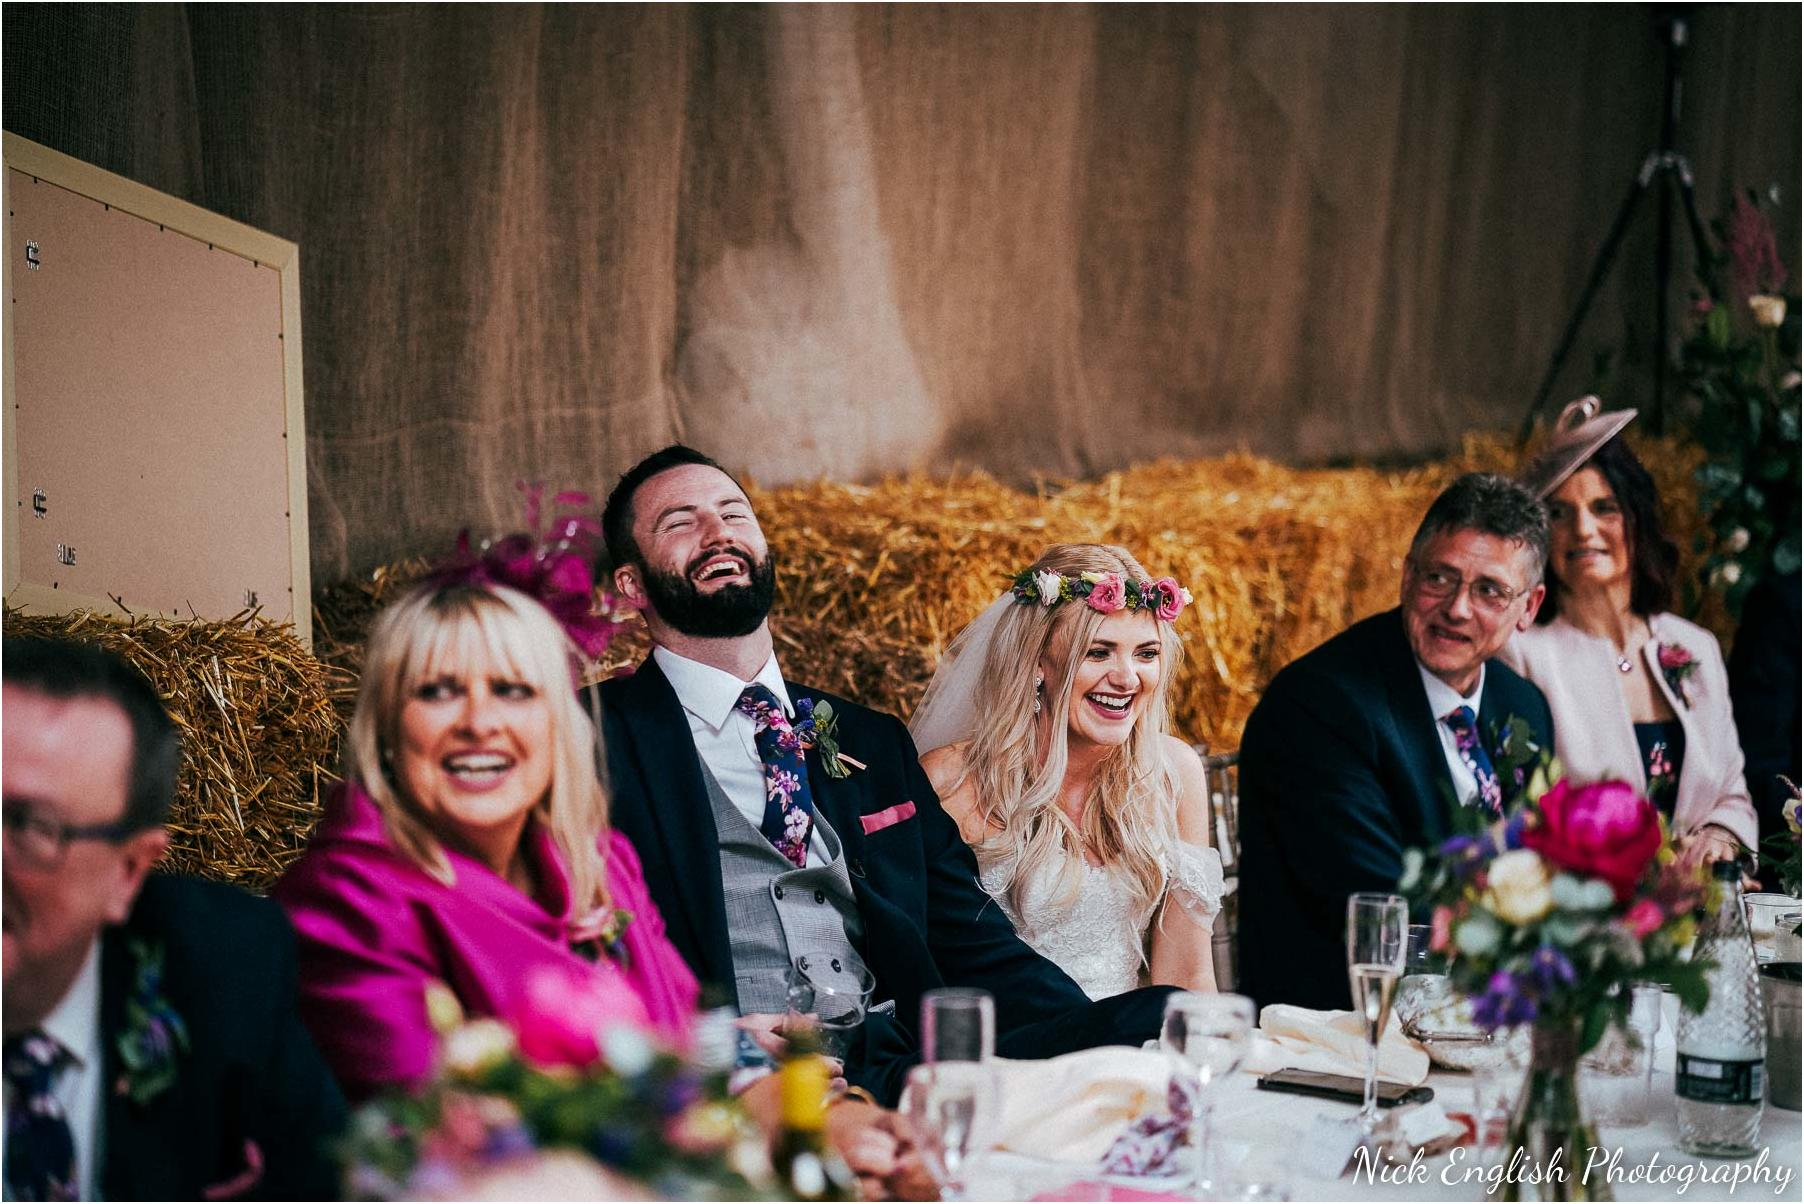 Whitebottom_Farm_Wedding_Manchester_Photograph-85.jpg